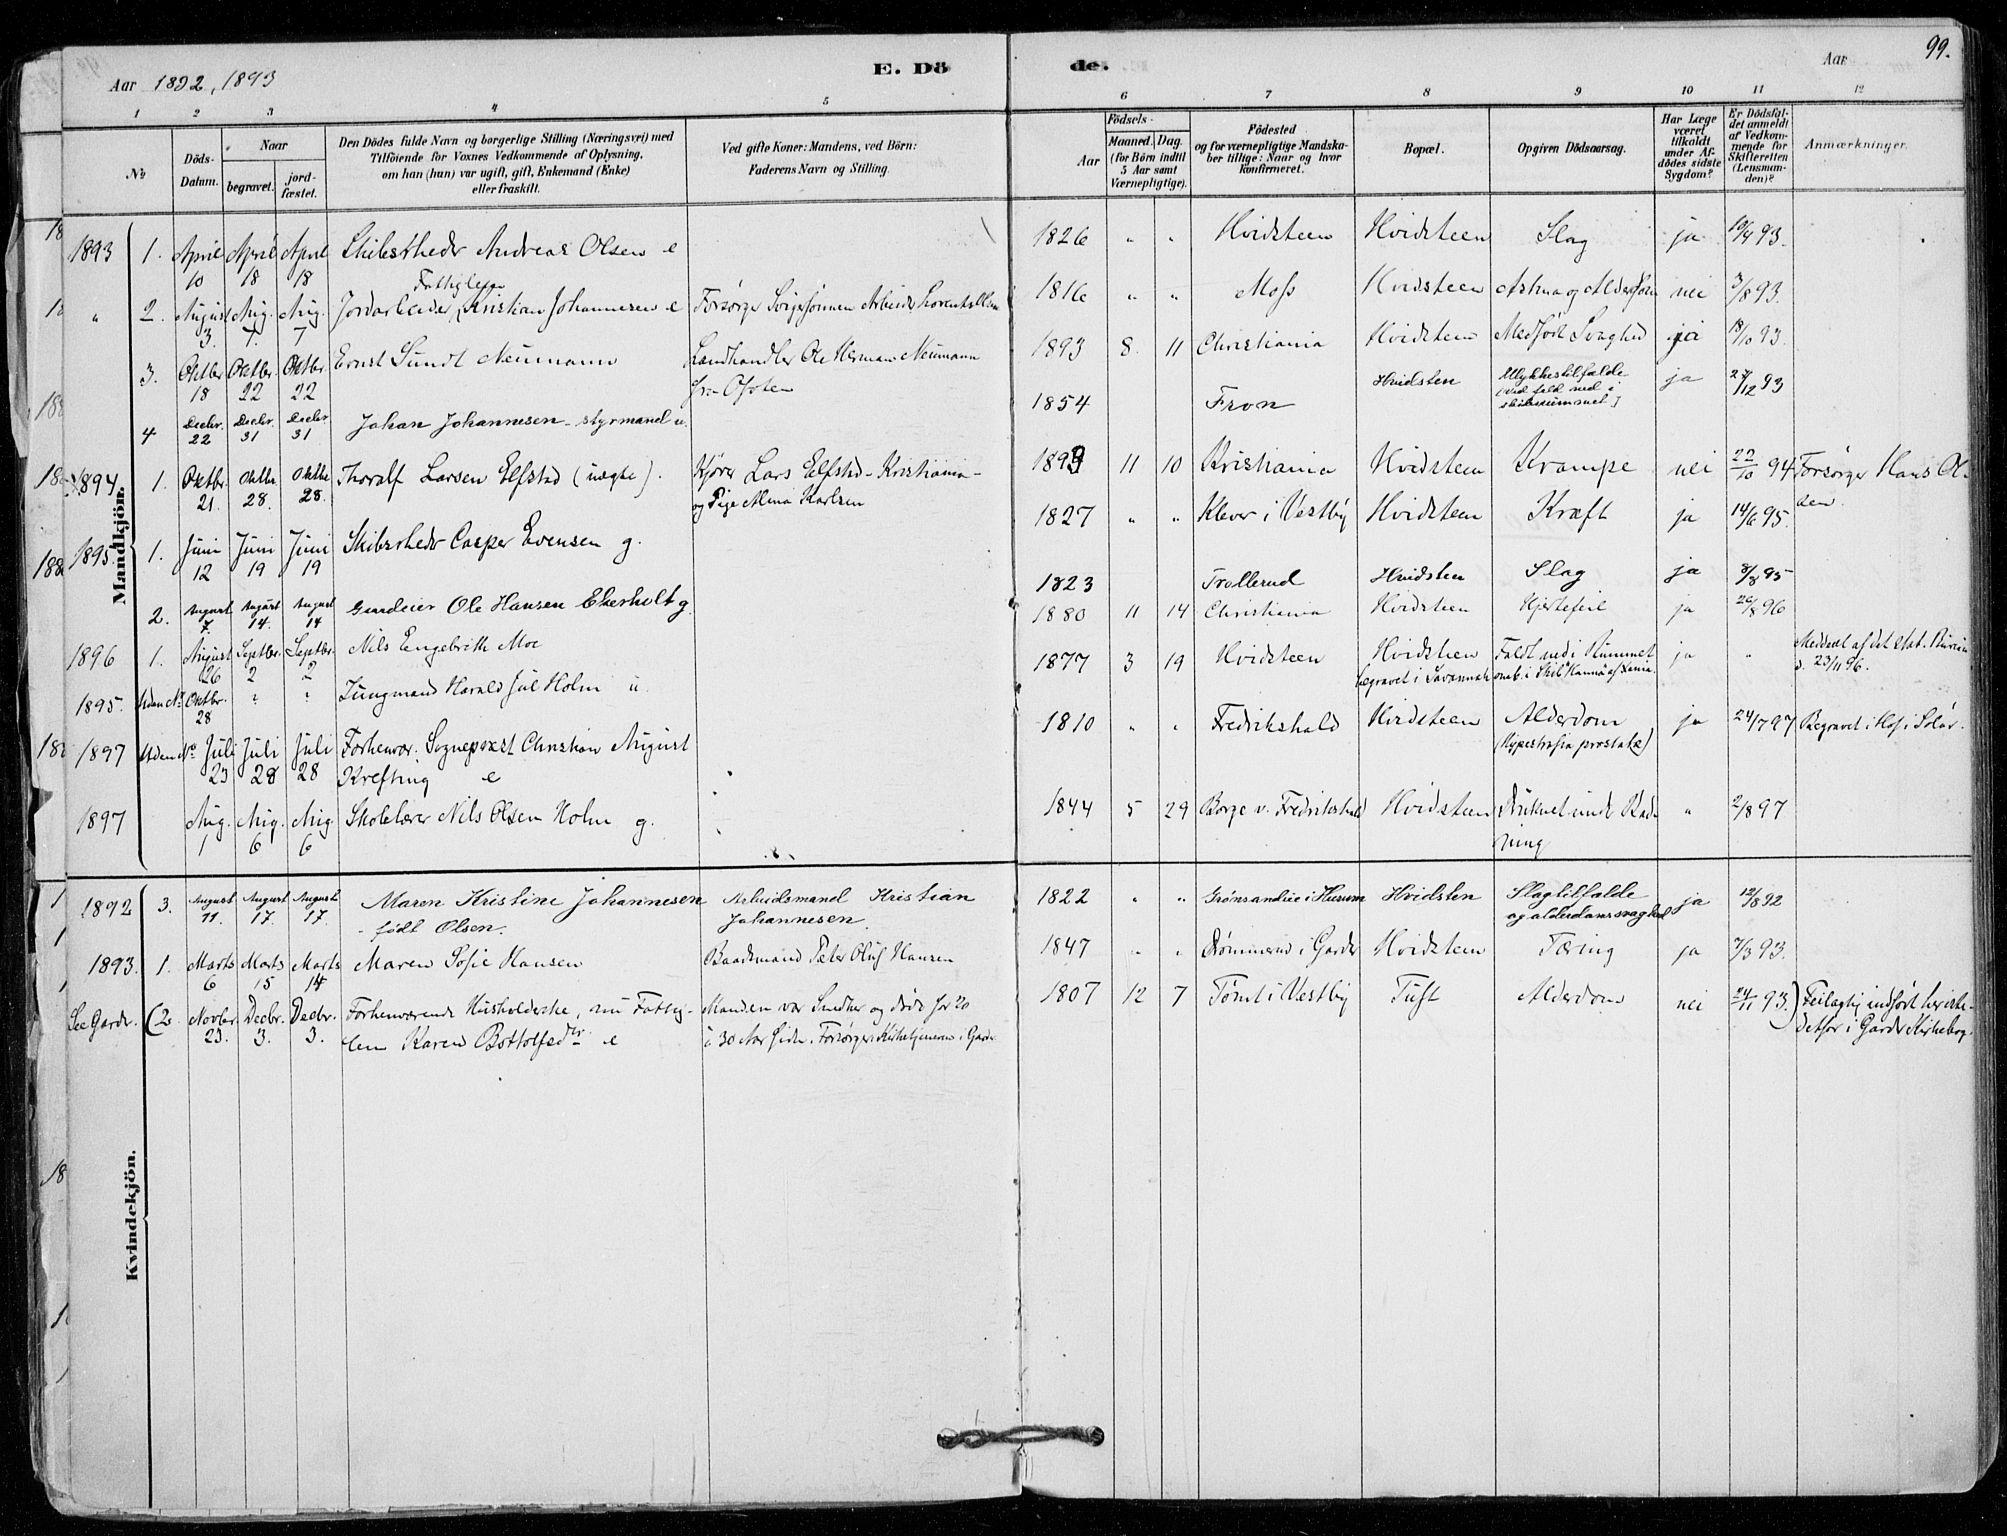 SAO, Vestby prestekontor Kirkebøker, F/Fd/L0001: Ministerialbok nr. IV 1, 1878-1945, s. 99